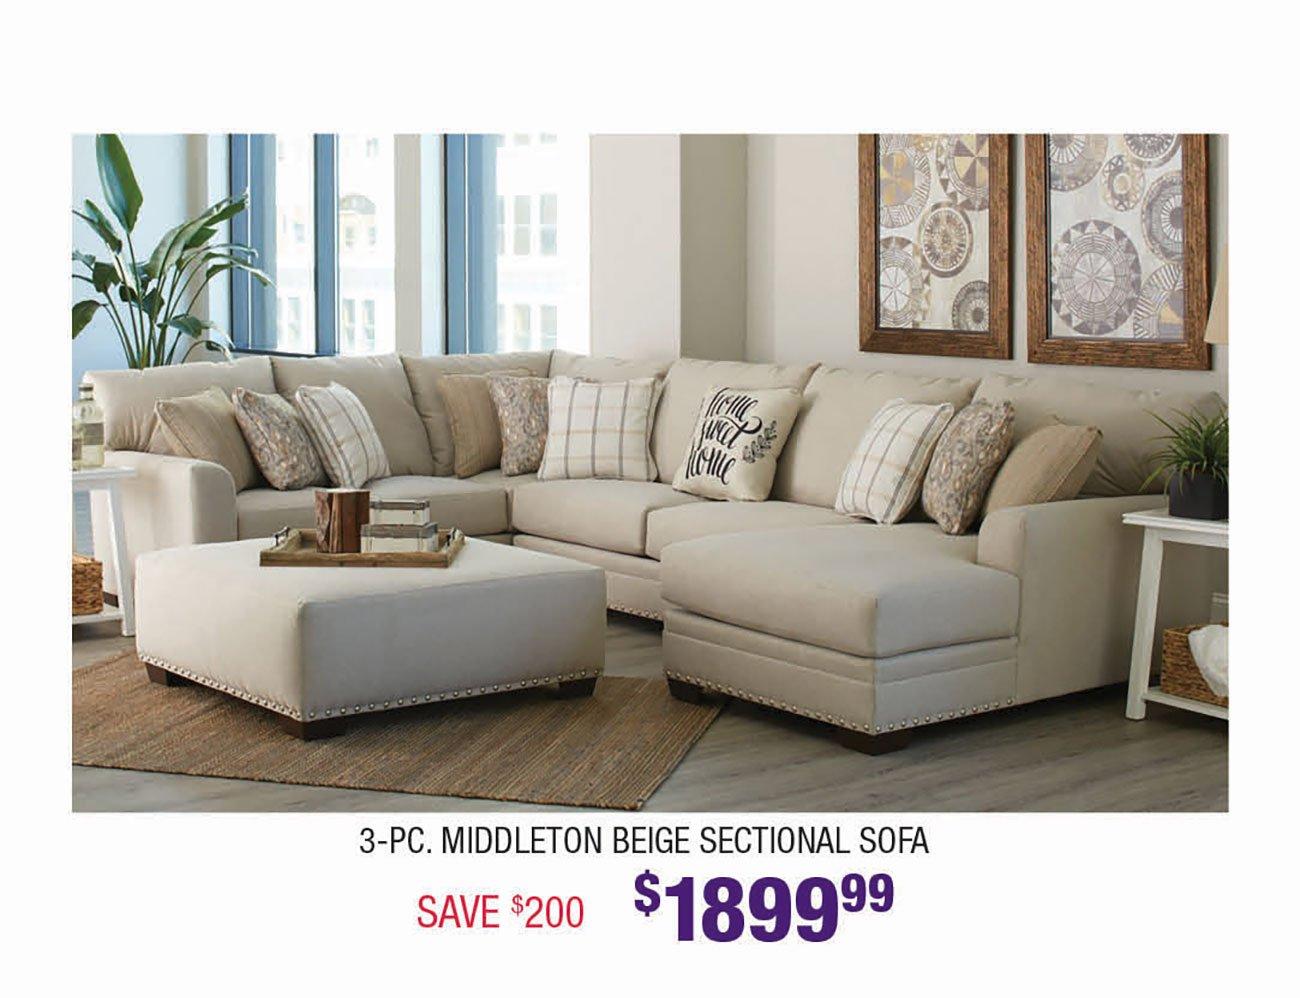 Middleton-Beige-Sectional-Sofa